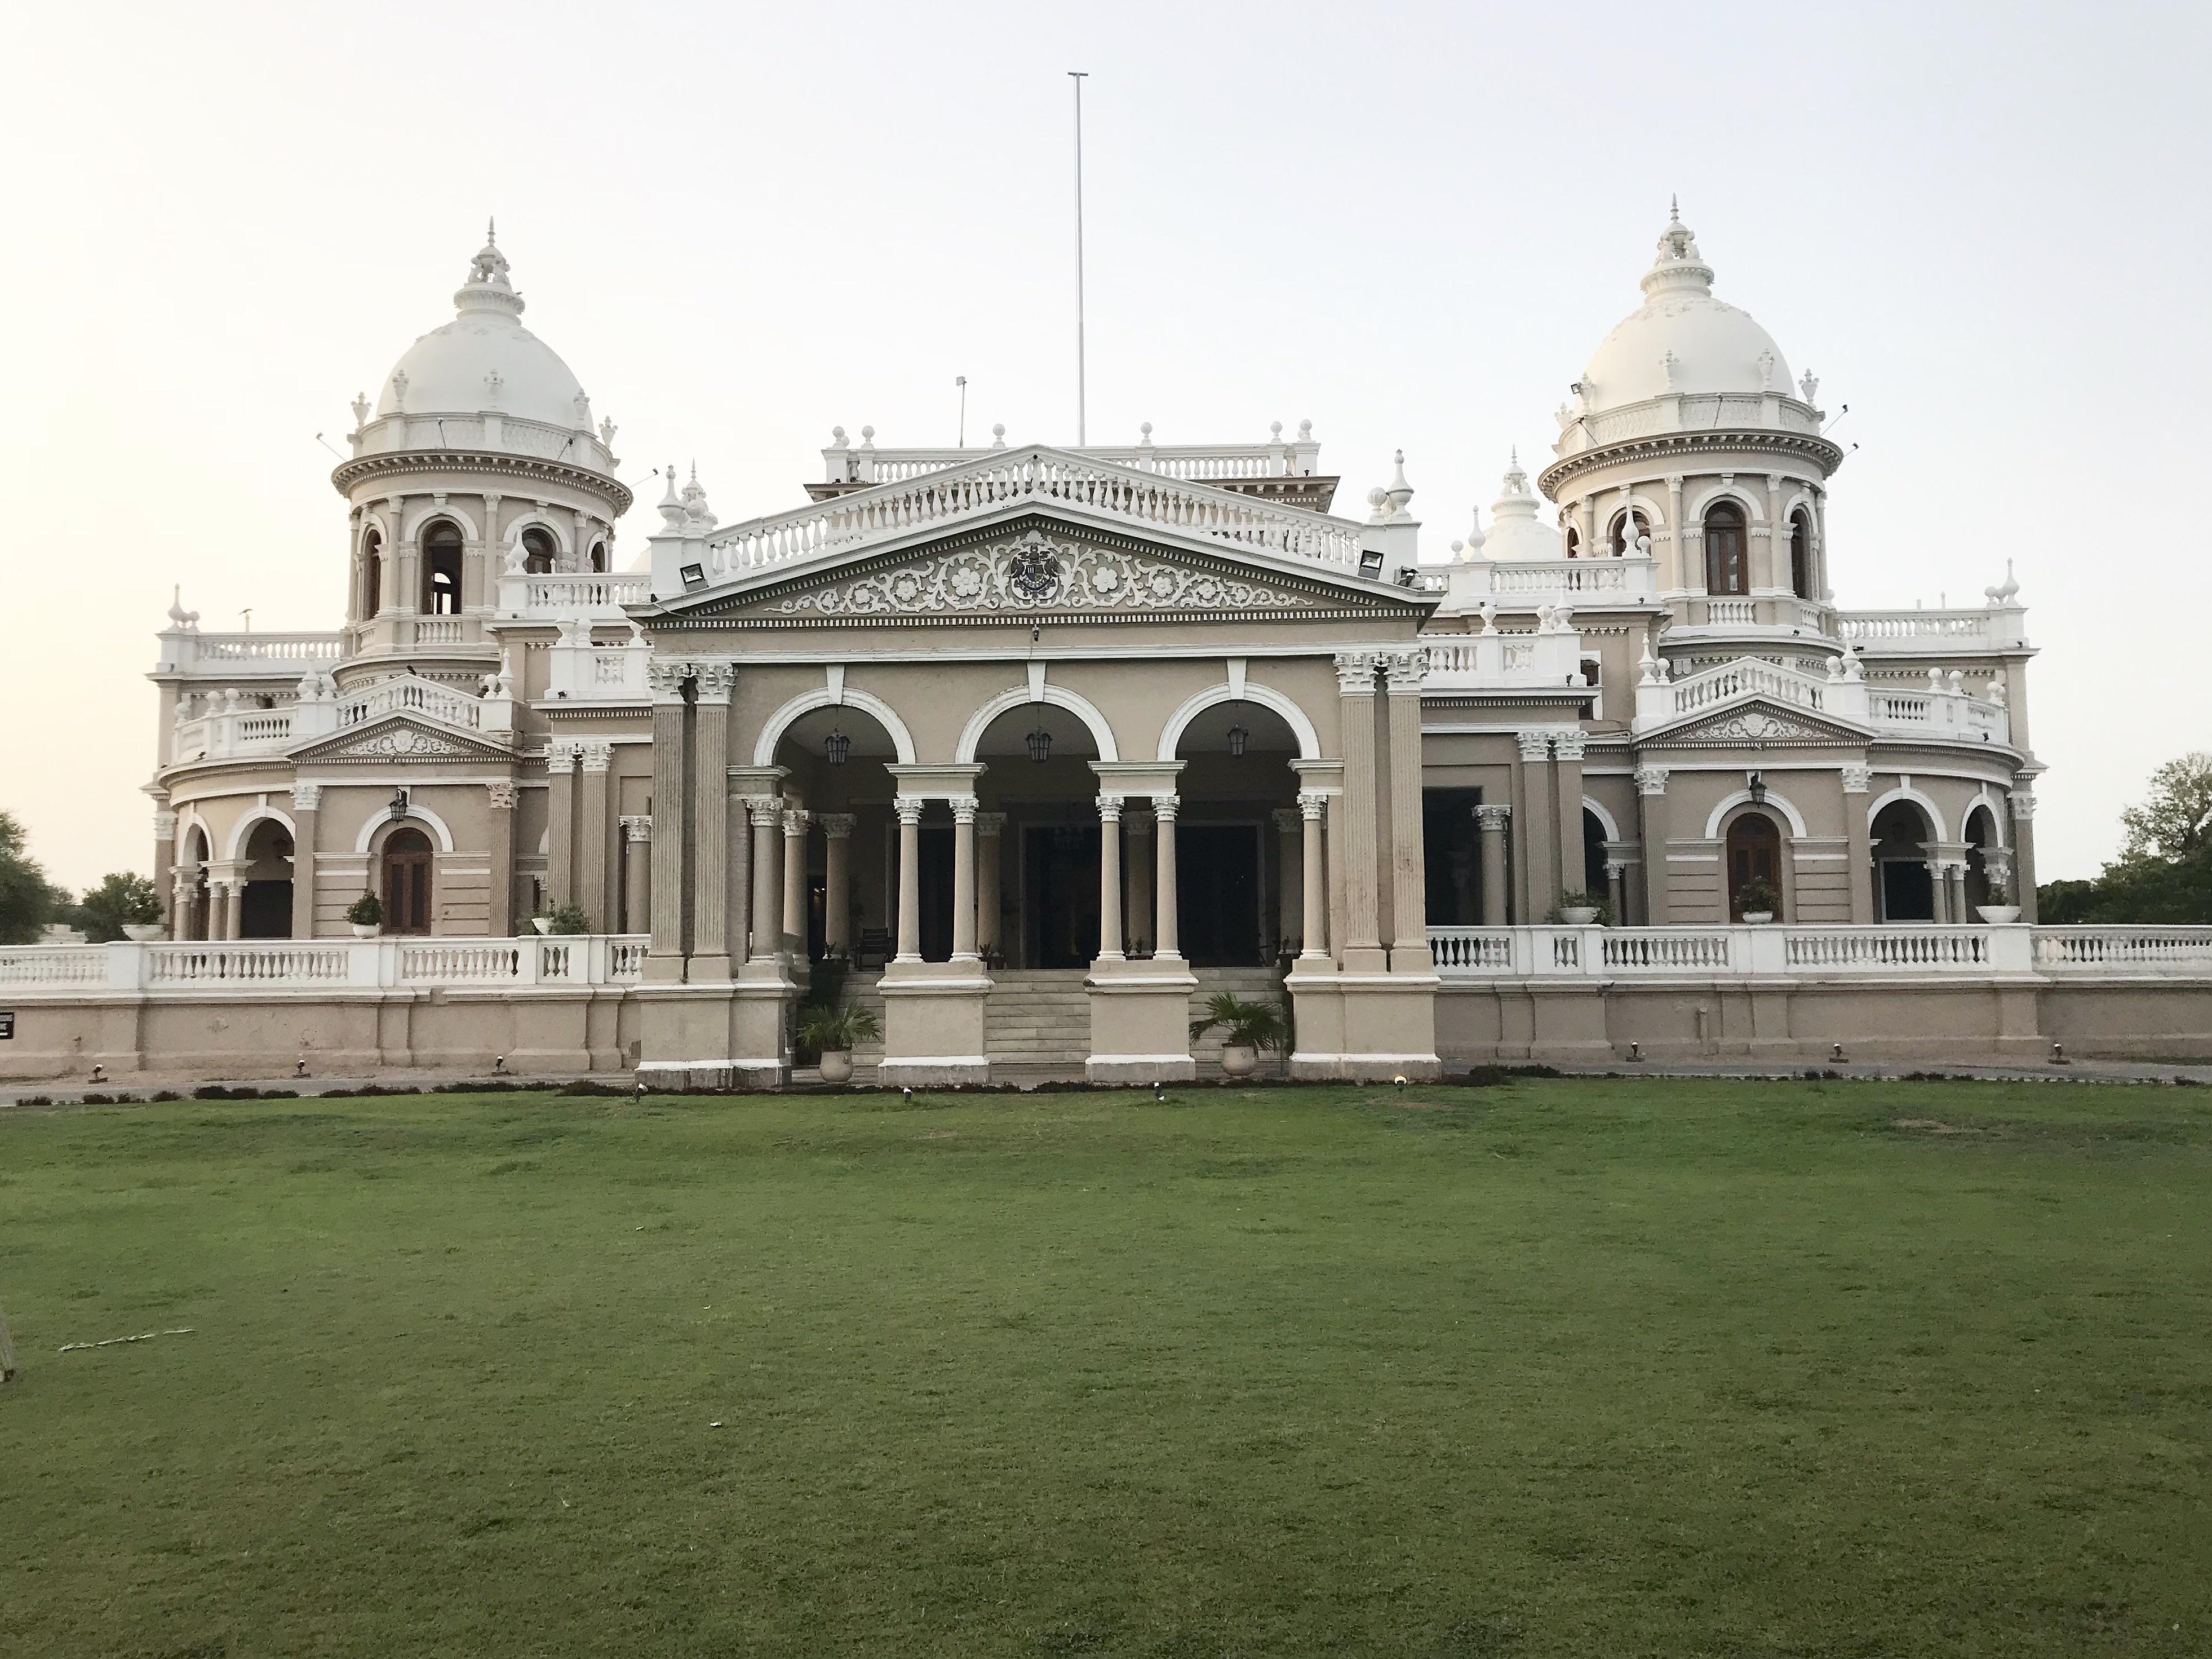 Gulzar Mahal